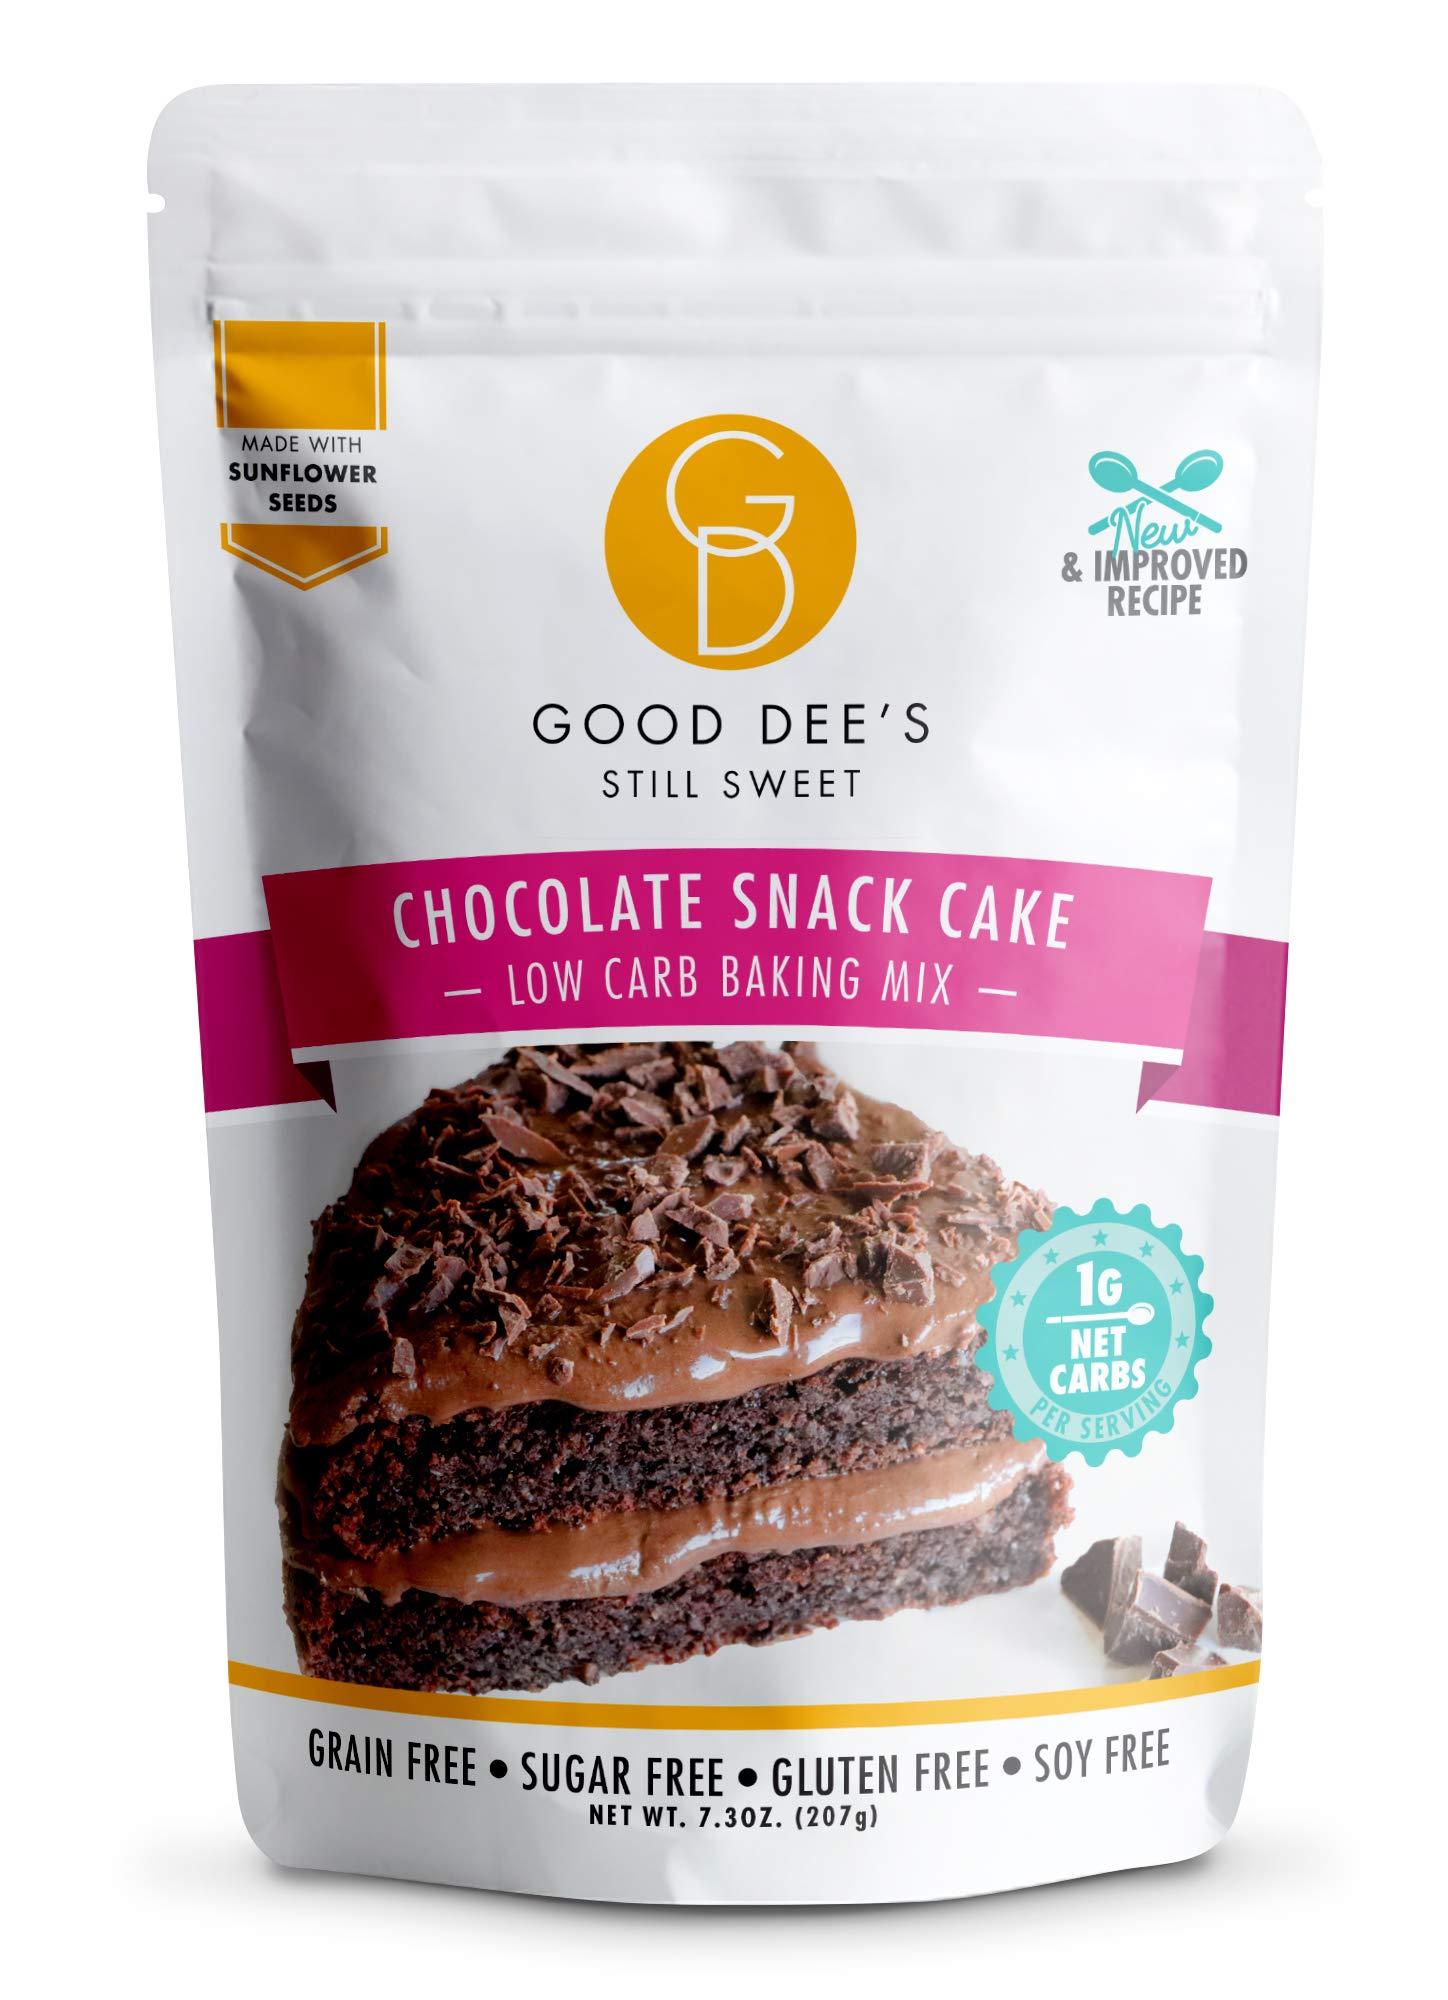 Good Dee's Chocolate Snack Cake Baking Mix - Low Carb Keto Baking Mix (1g Net Carbs, 12 Serving) | Sugar-Free, Gluten-Free, Grain-Free, Soy-Free & Nut-Free | Diabetic, Atkins & WW Friendly